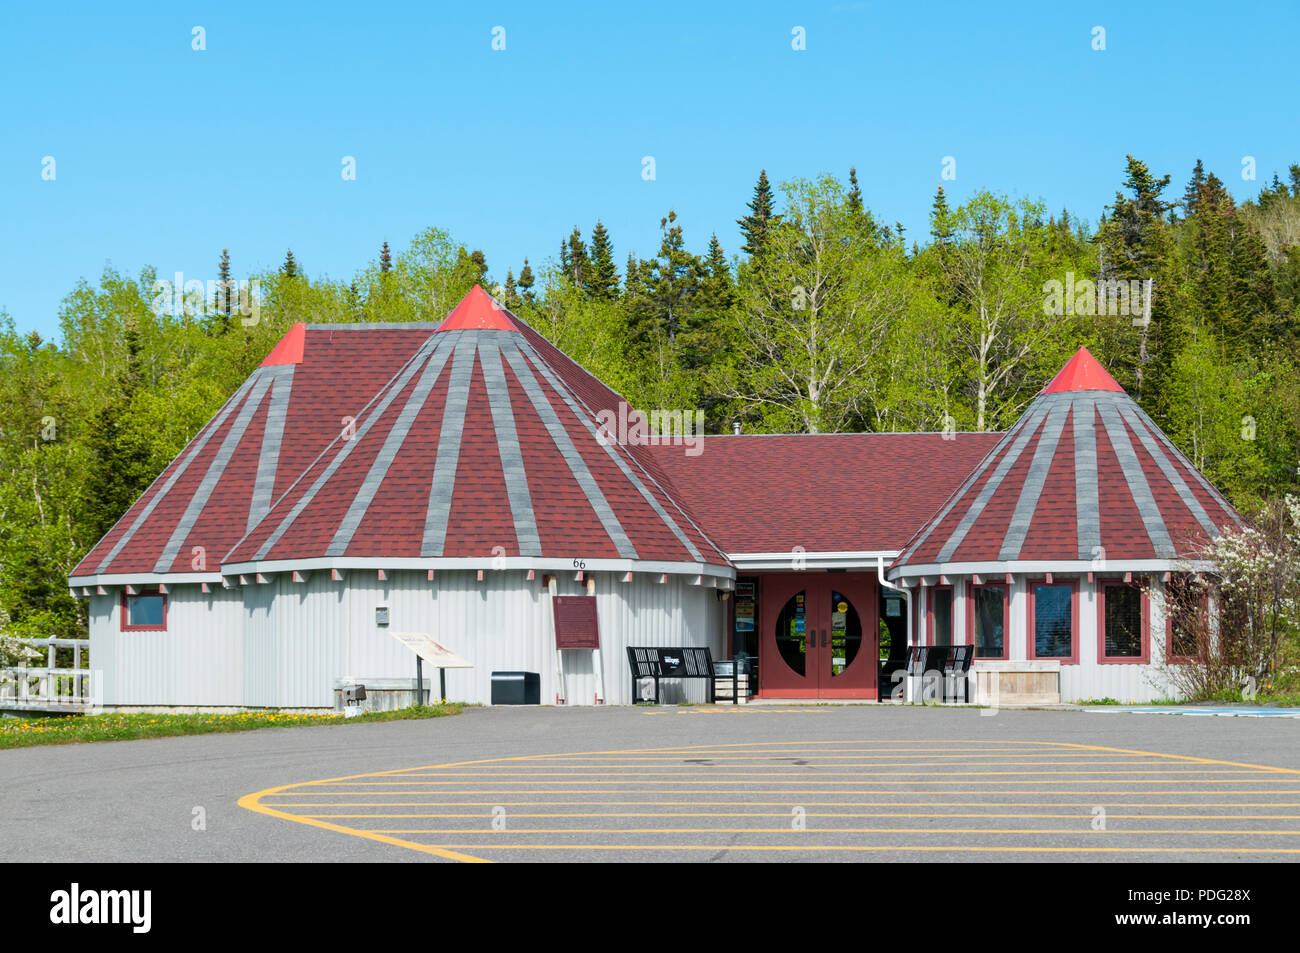 The Beothuk Interpretation Centre Provincial Historic Site at Boyd's Cove, Newfoundland. - Stock Image